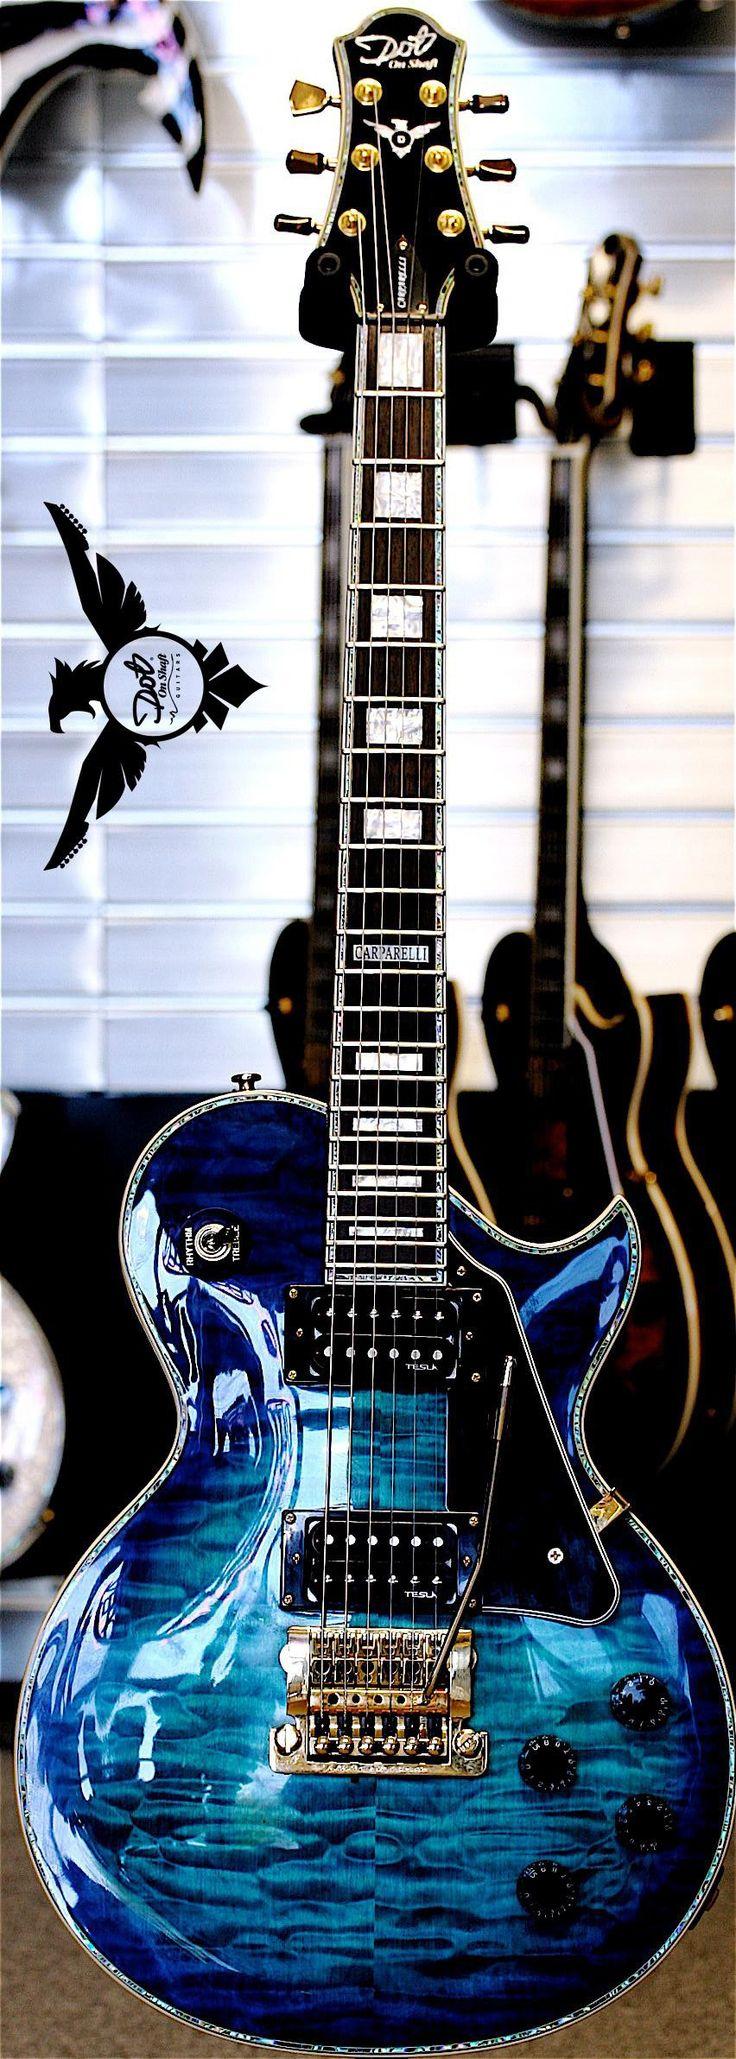 Dot On Shaft Guitars Carparelli Signature Series Model Ocean Blueburst with a Kahler Hybrid Tremolo Bridge System